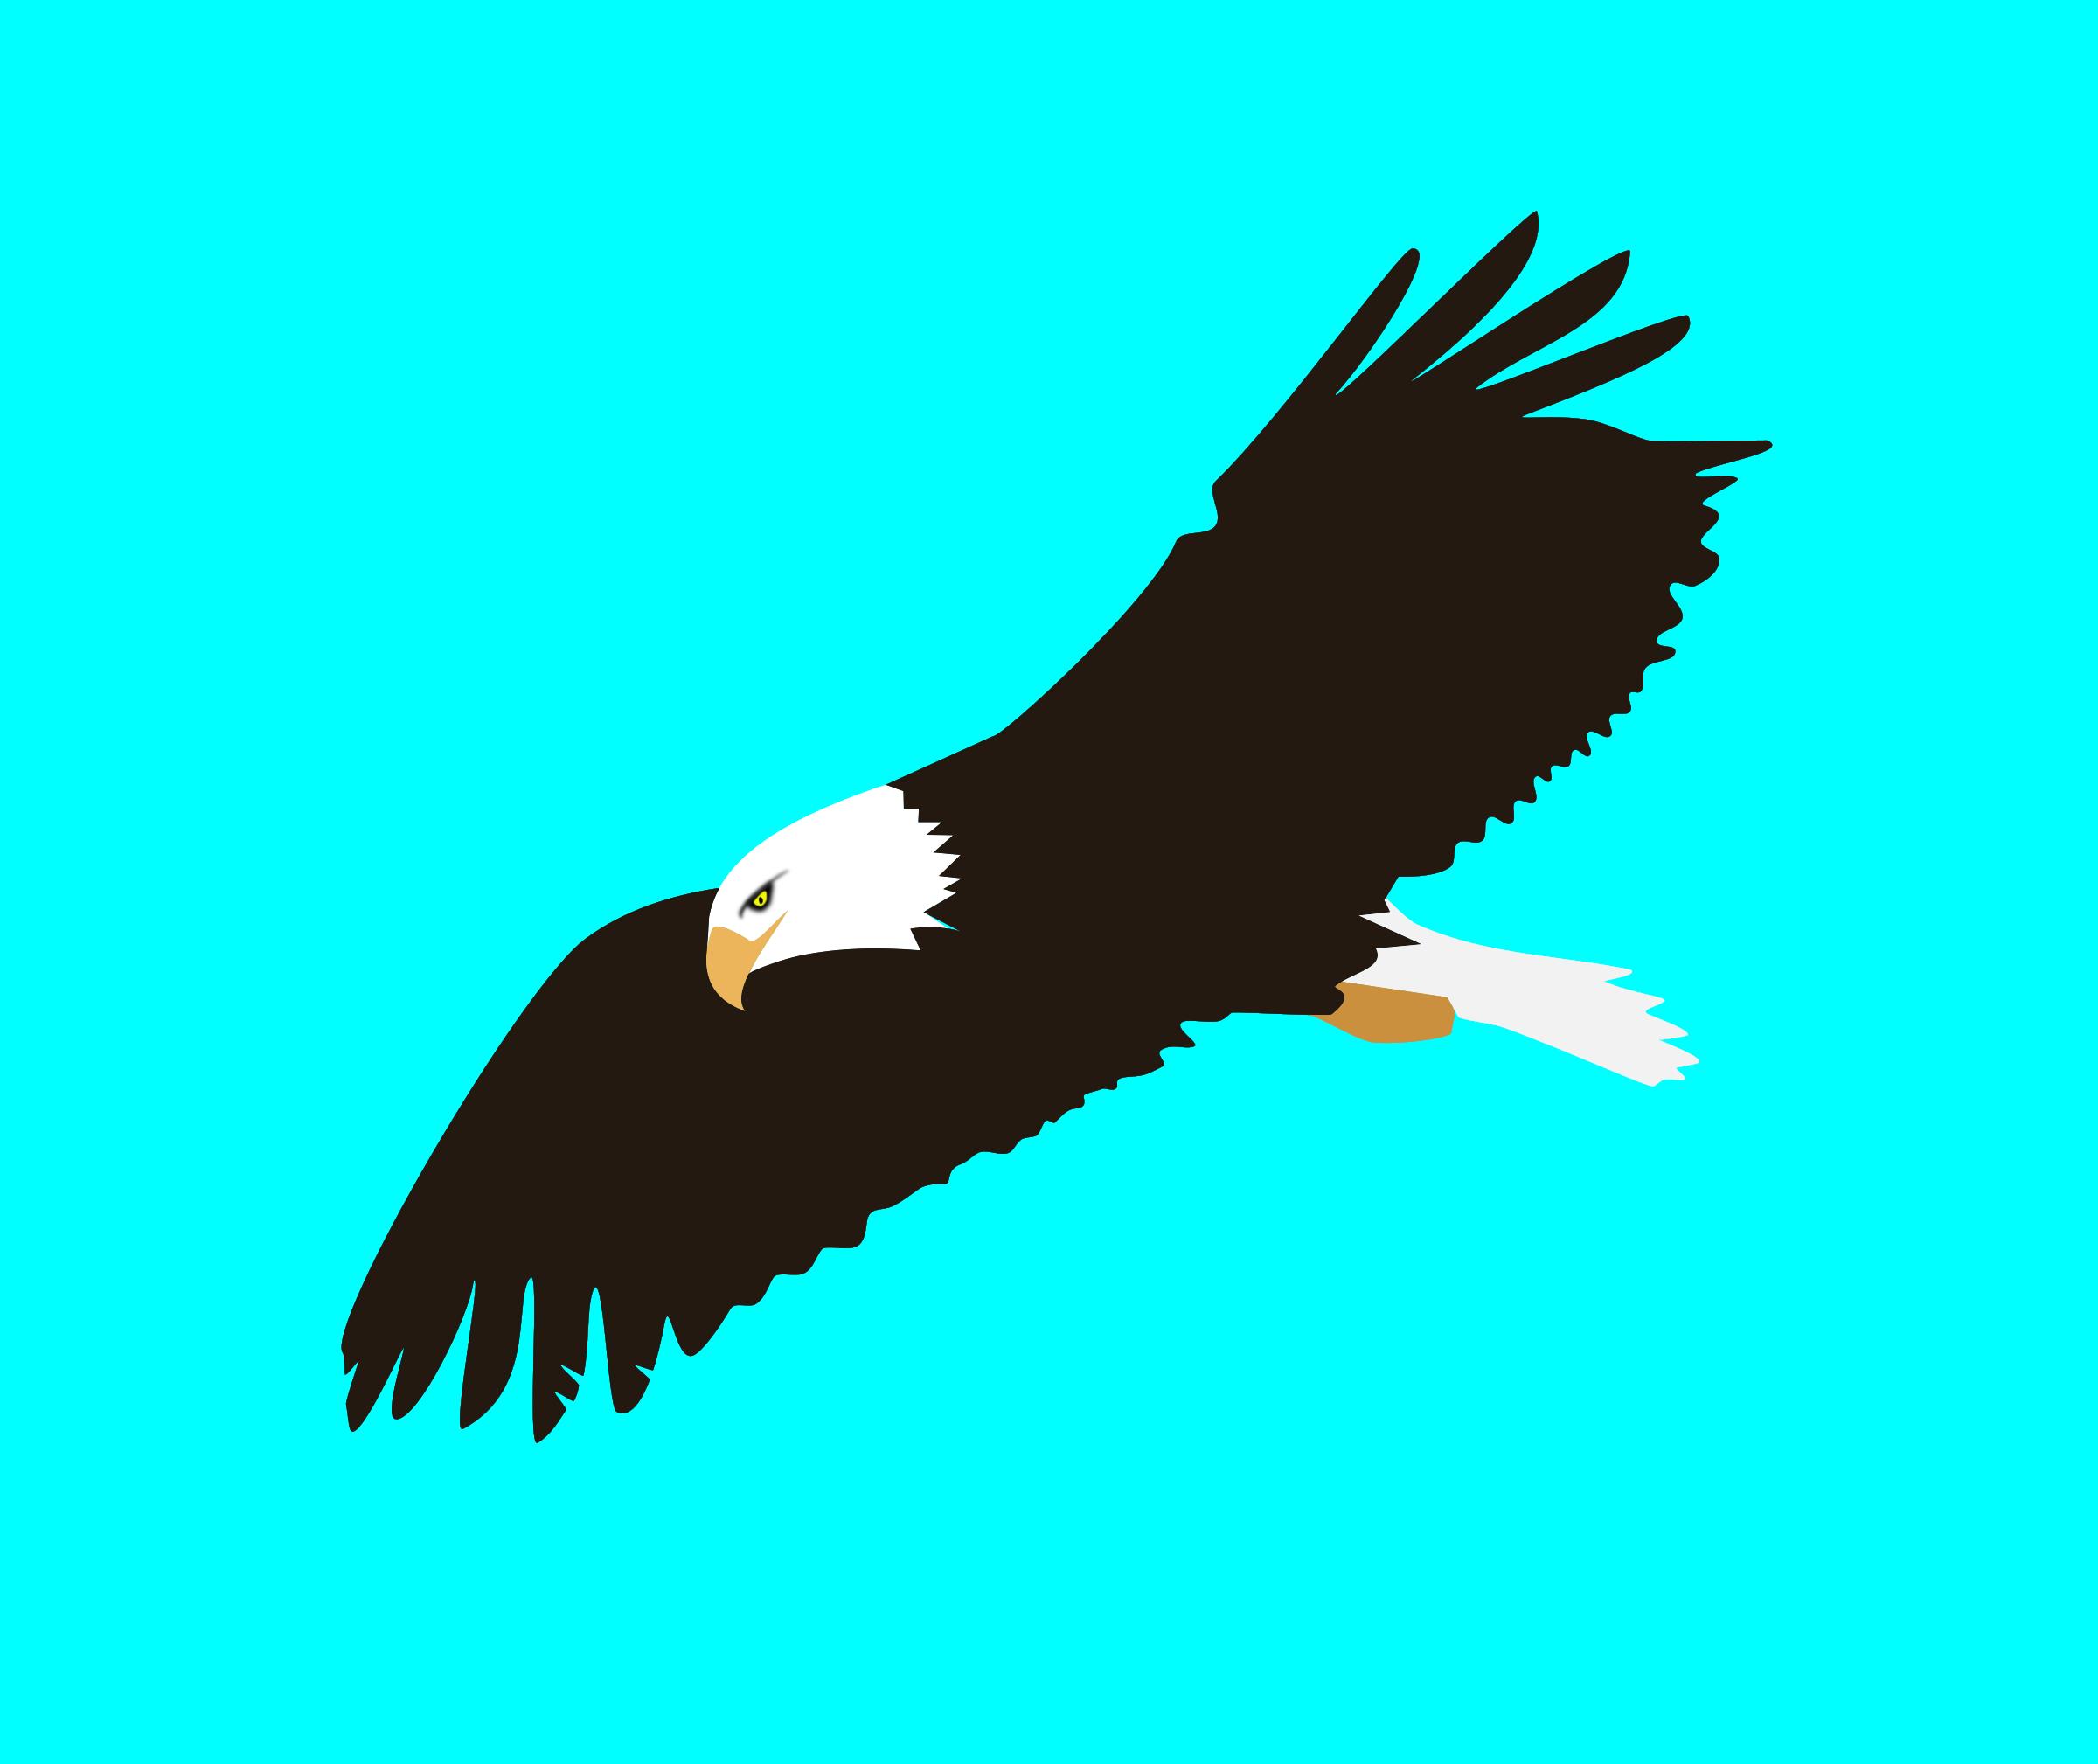 Soaring big image png. Animals clipart eagle